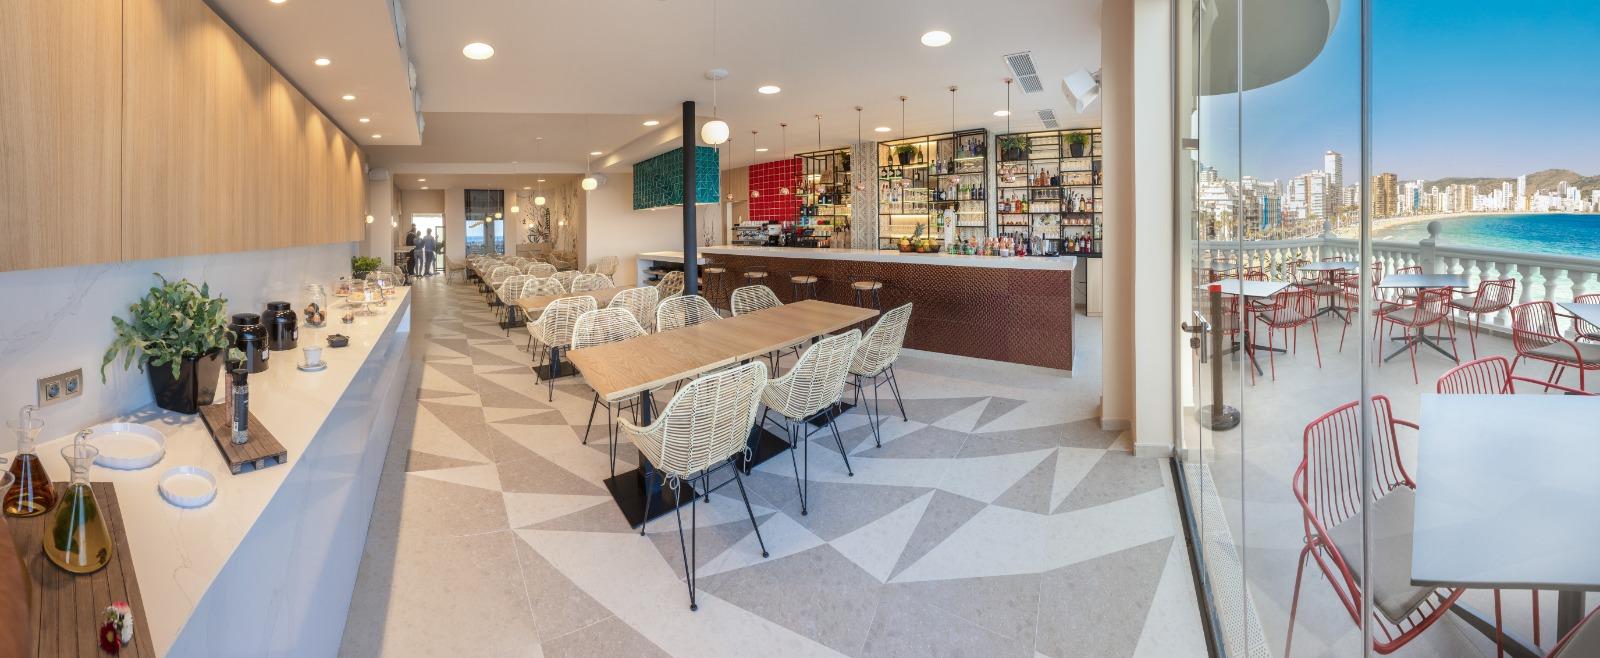 restaurante-dvora-benidorm